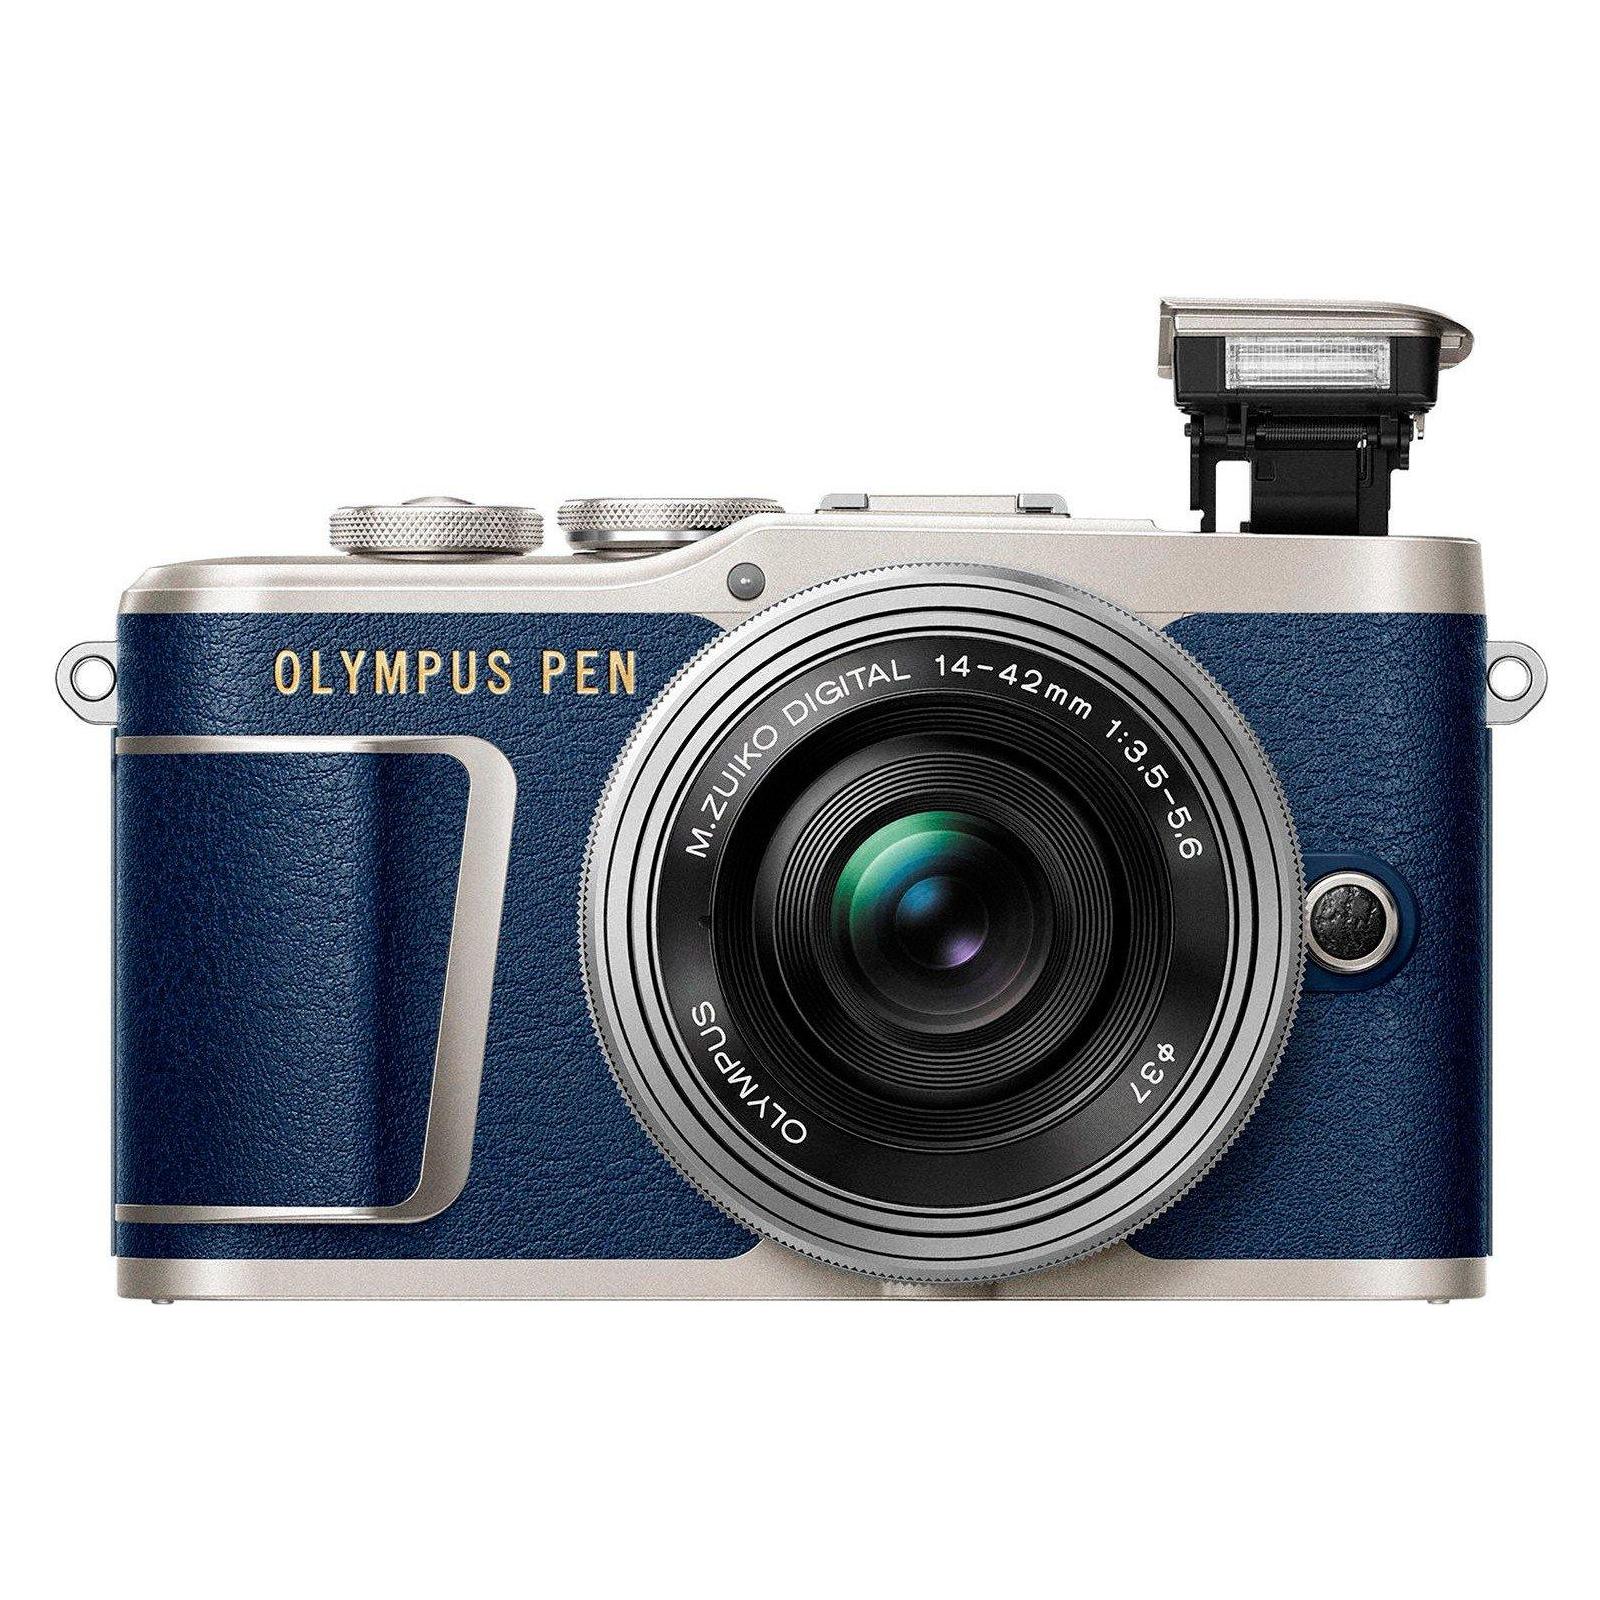 Цифровой фотоаппарат OLYMPUS E-PL9 14-42 mm Pancake Zoom Kit blue/silver (V205092UE000) изображение 5